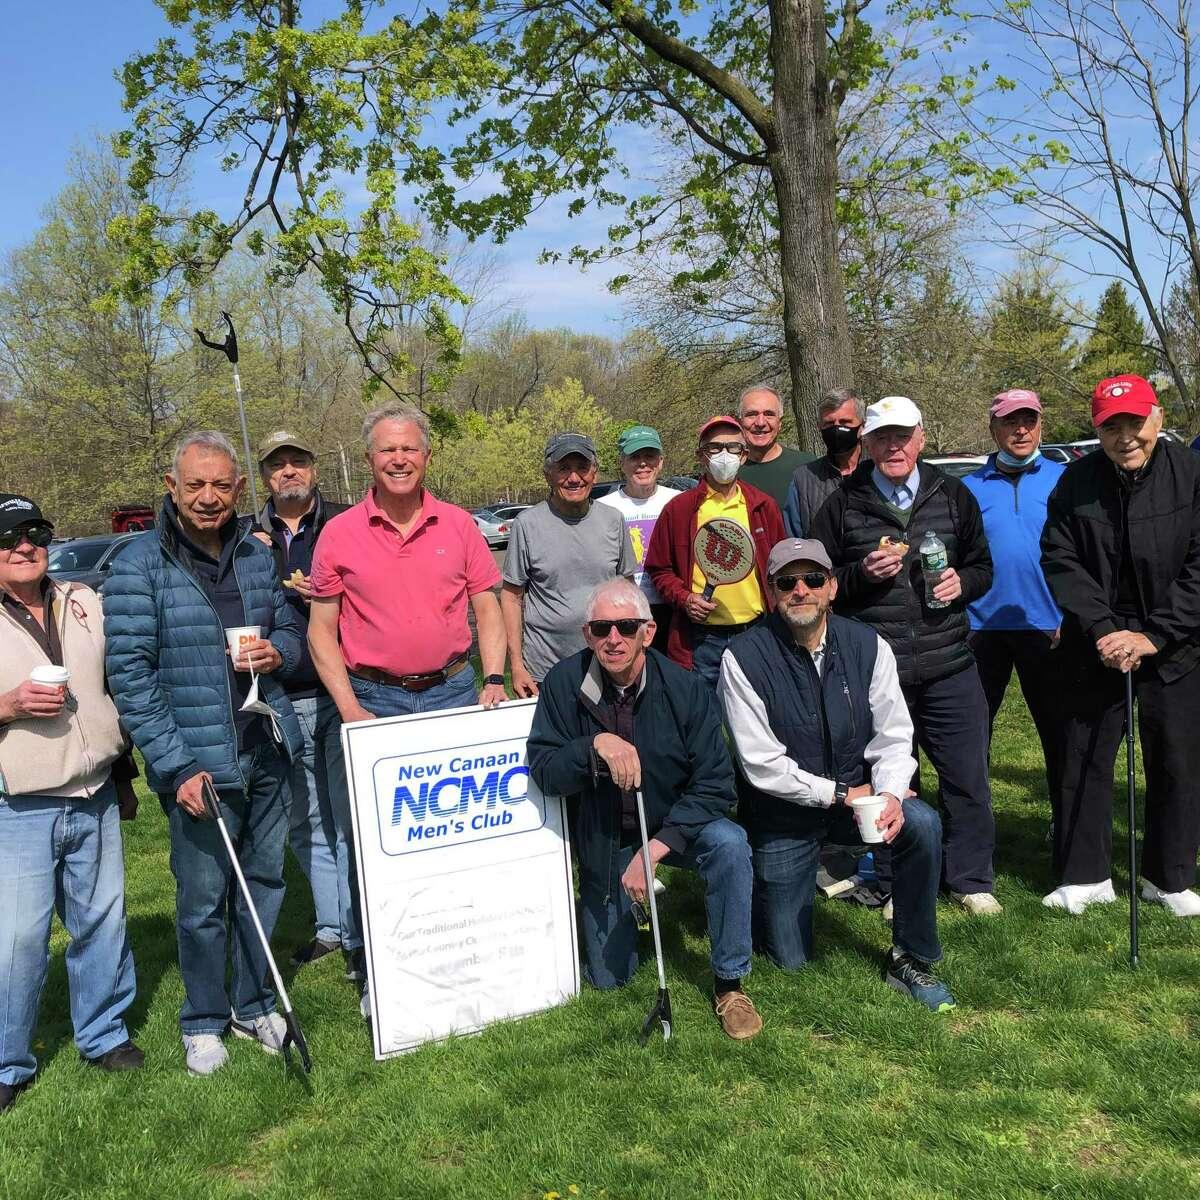 Misters Clean: Members of the New Canaan Men's Club recently took part in last week's